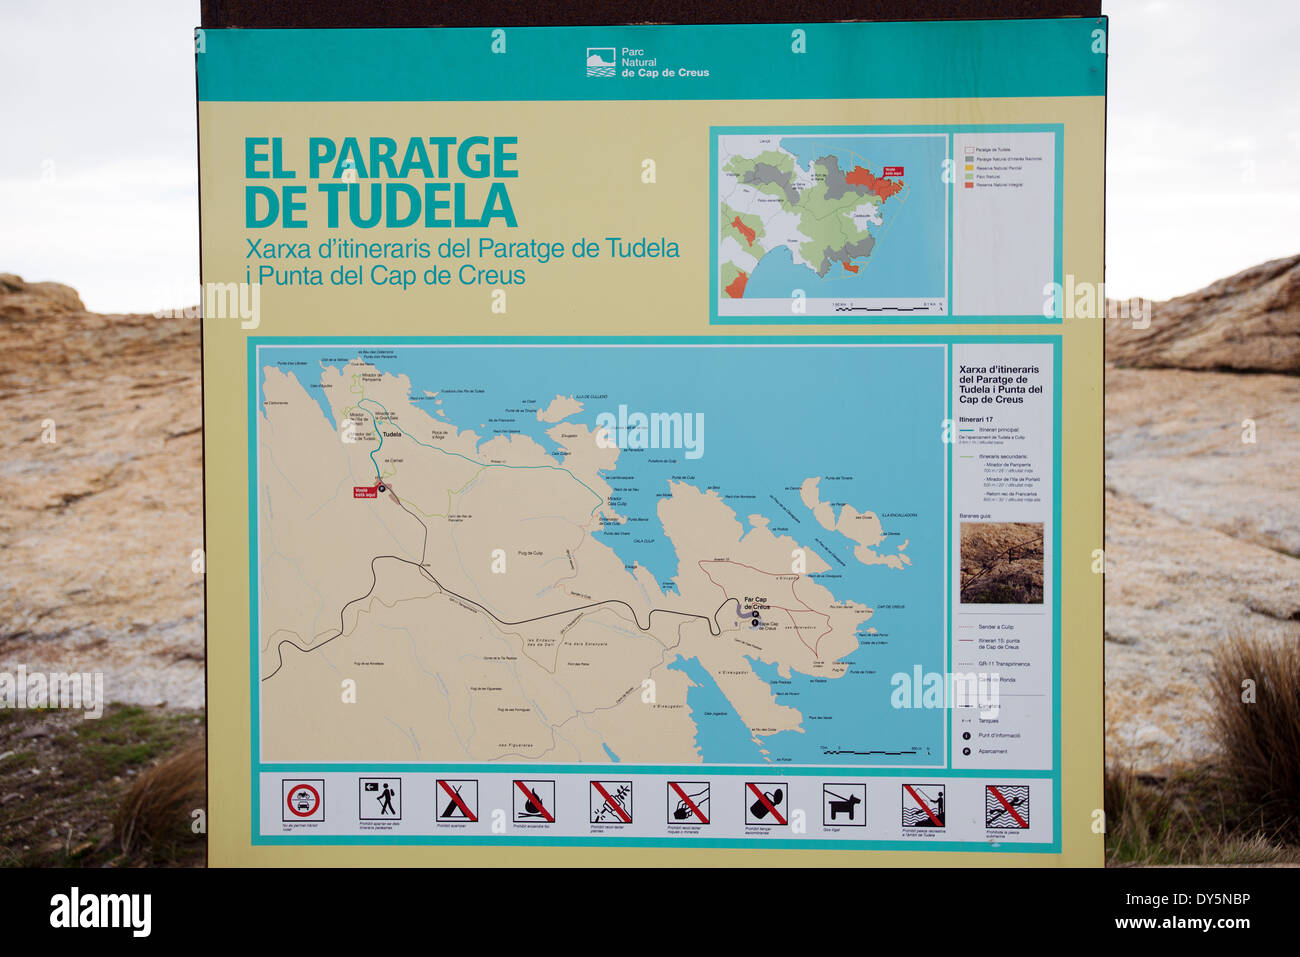 Karte Costa Brava Spanien.Cap De Creus Natur Park Karte Aushangeschild Costa Brava In